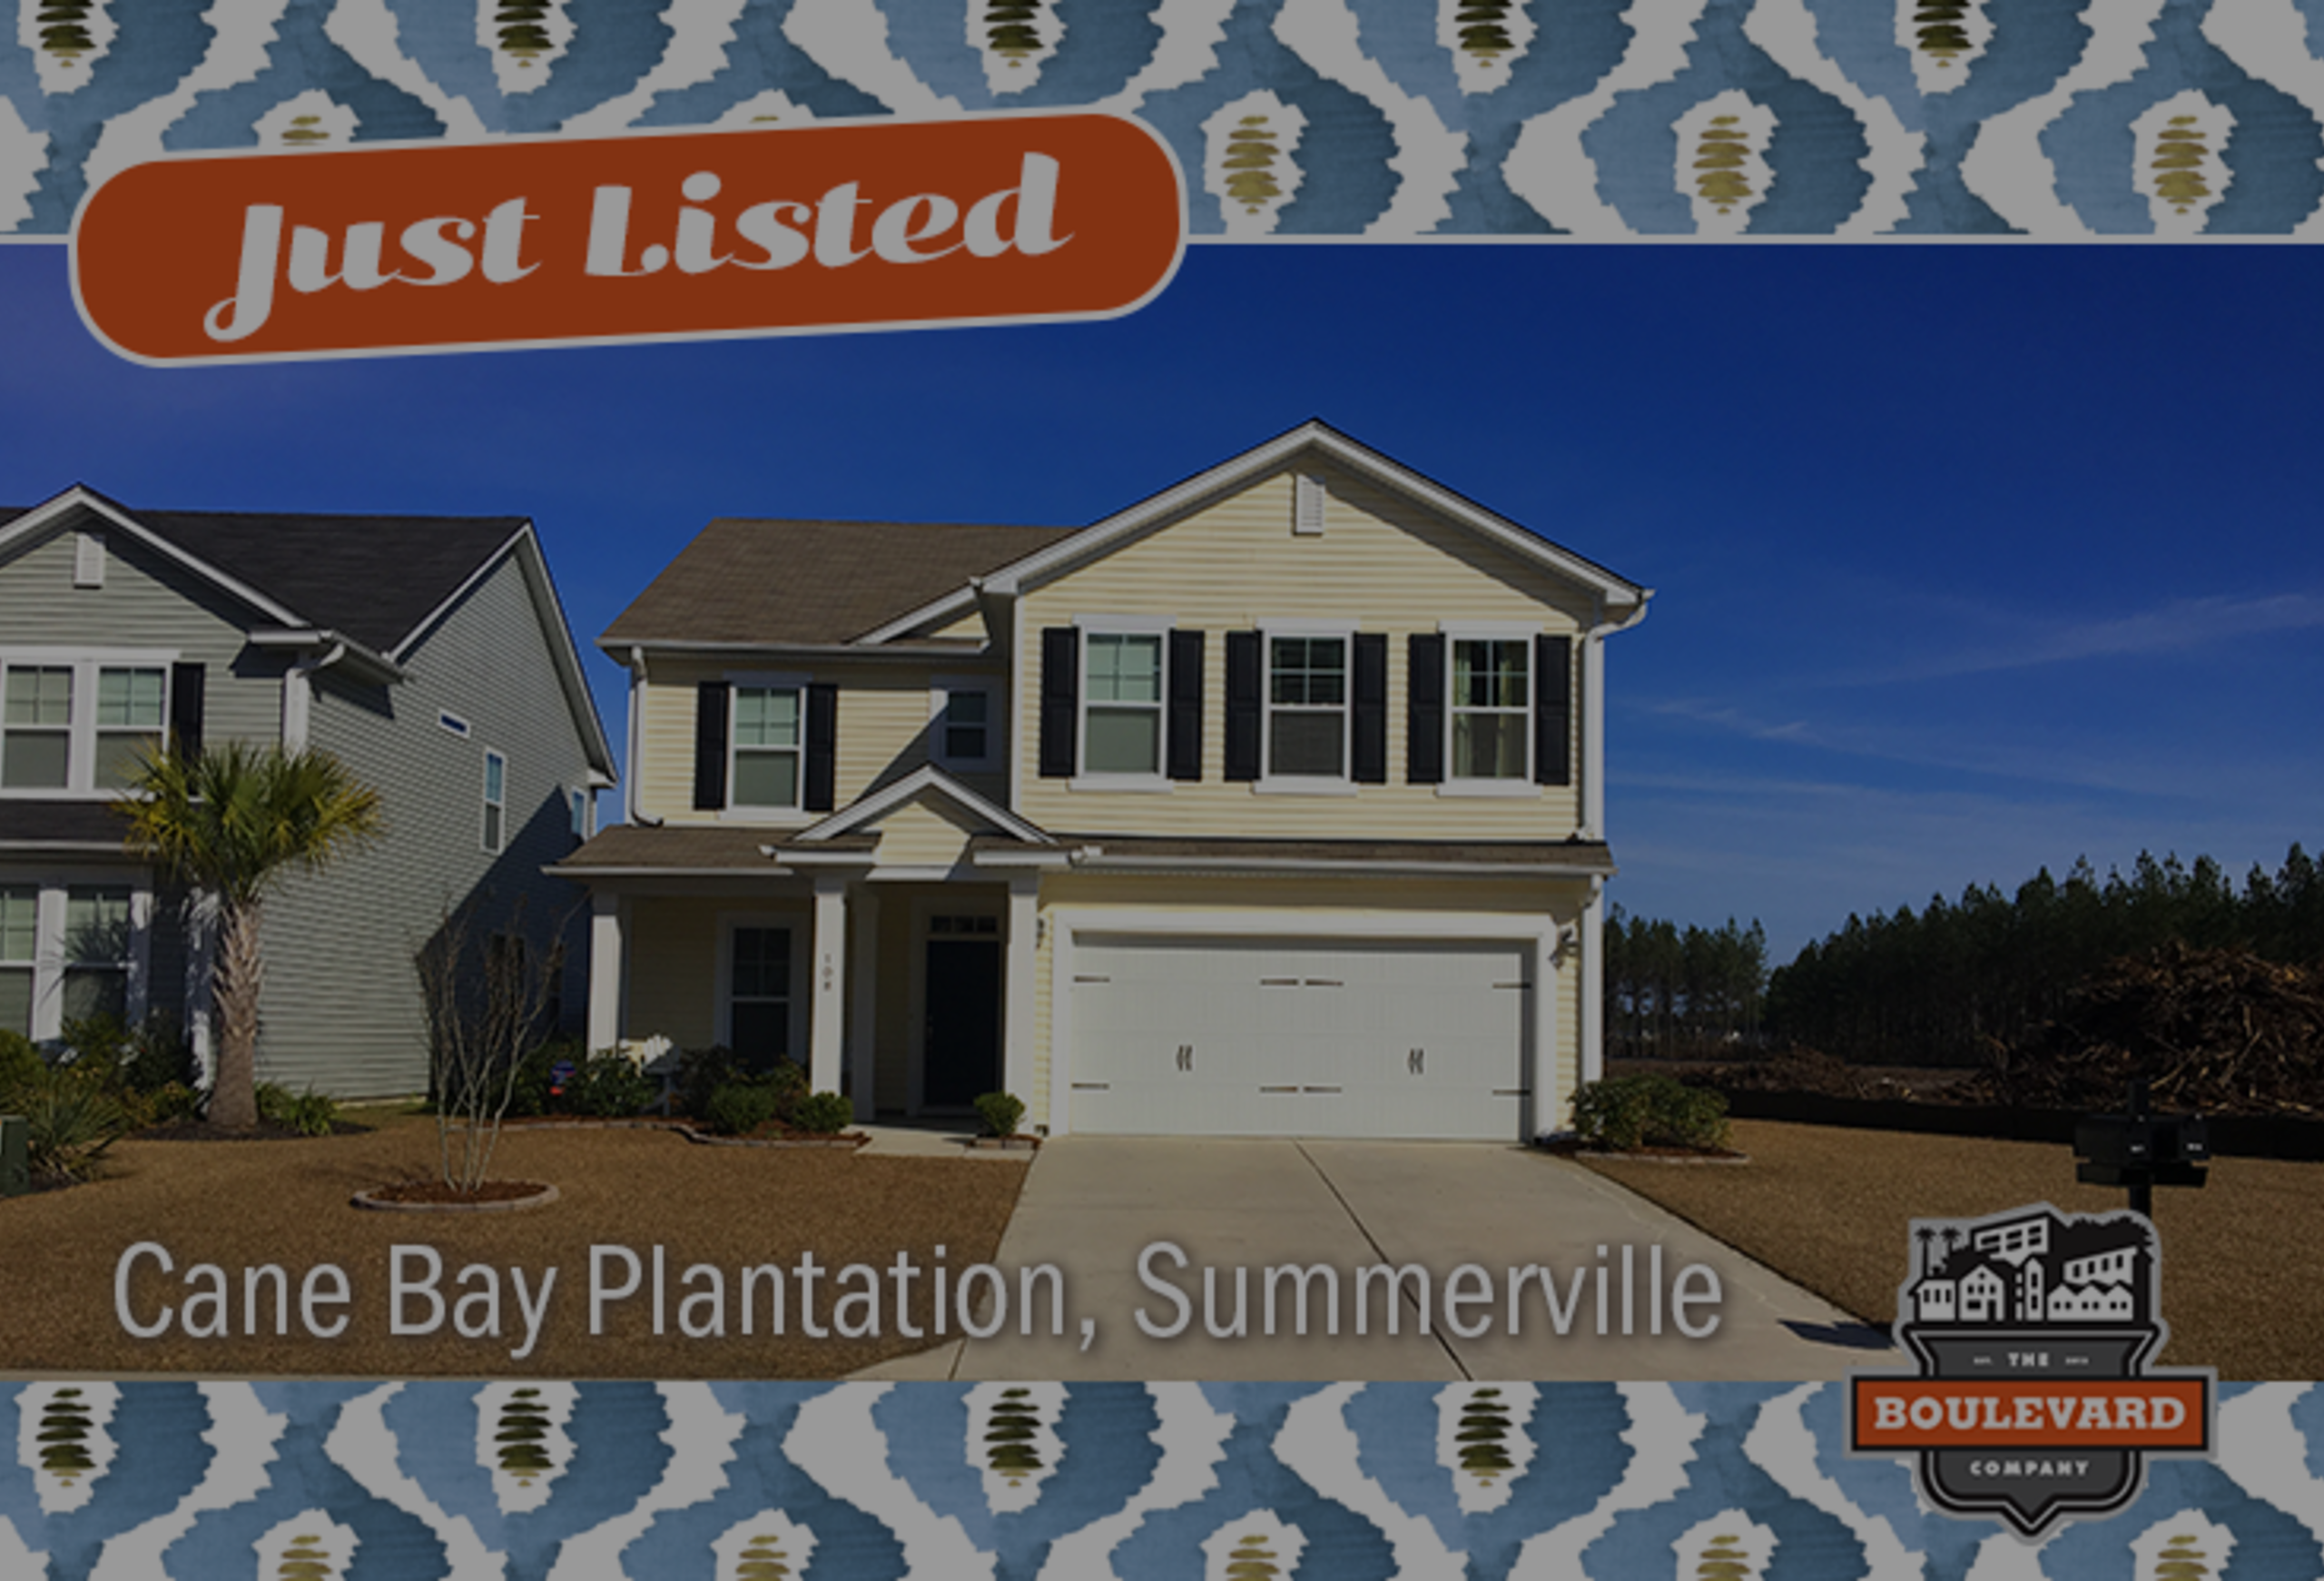 new listing: 108 Glenspring Drive in Cane Bay Plantation